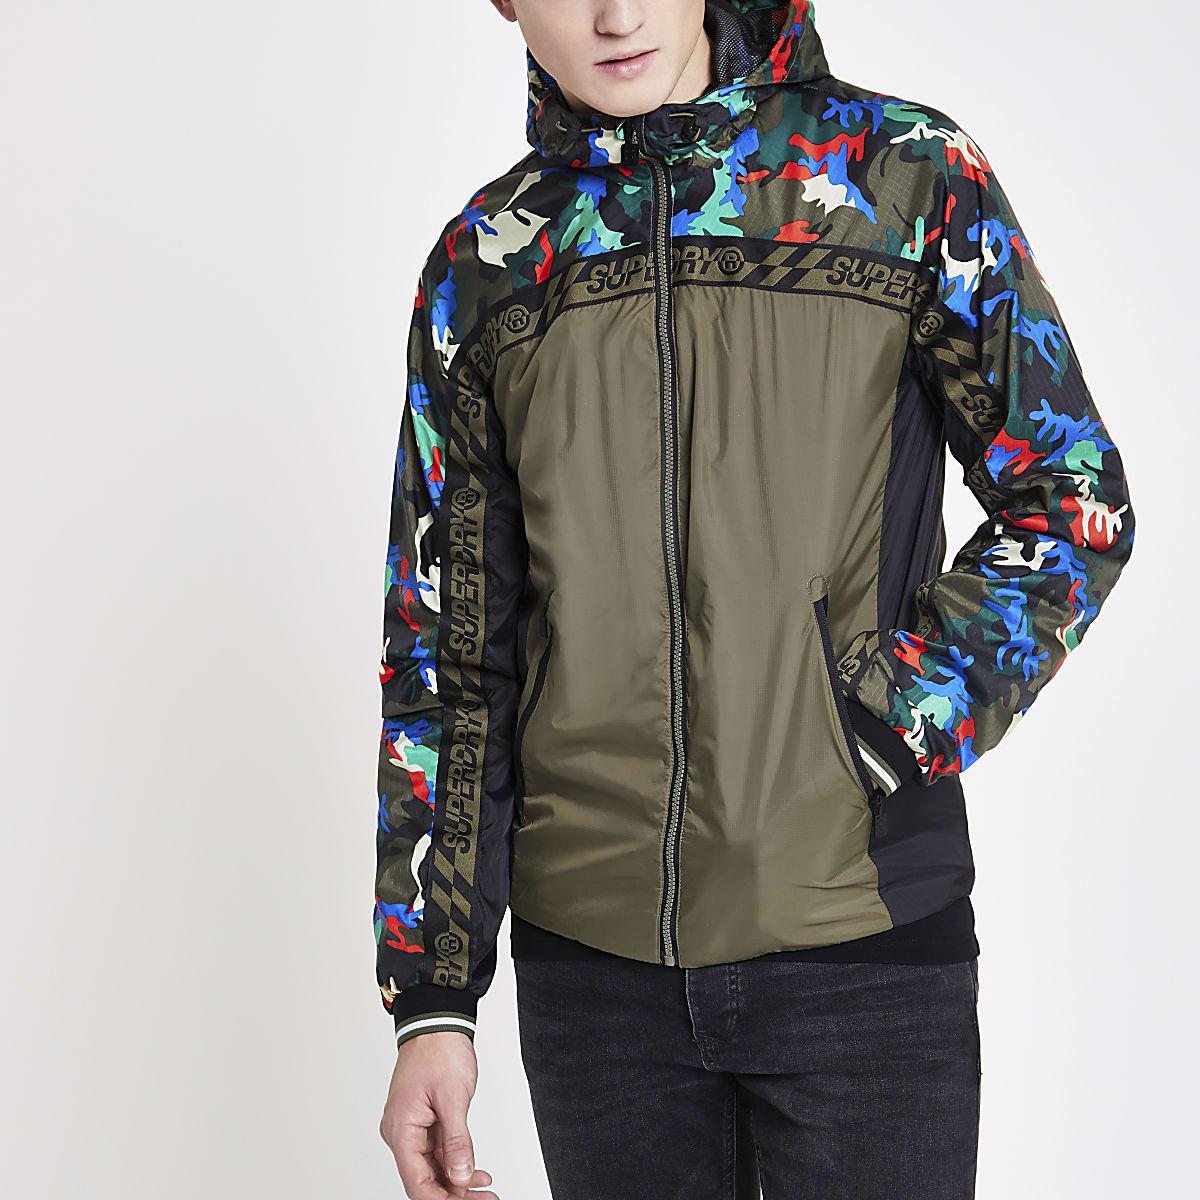 Superdry - Groen jack met camouflageprint